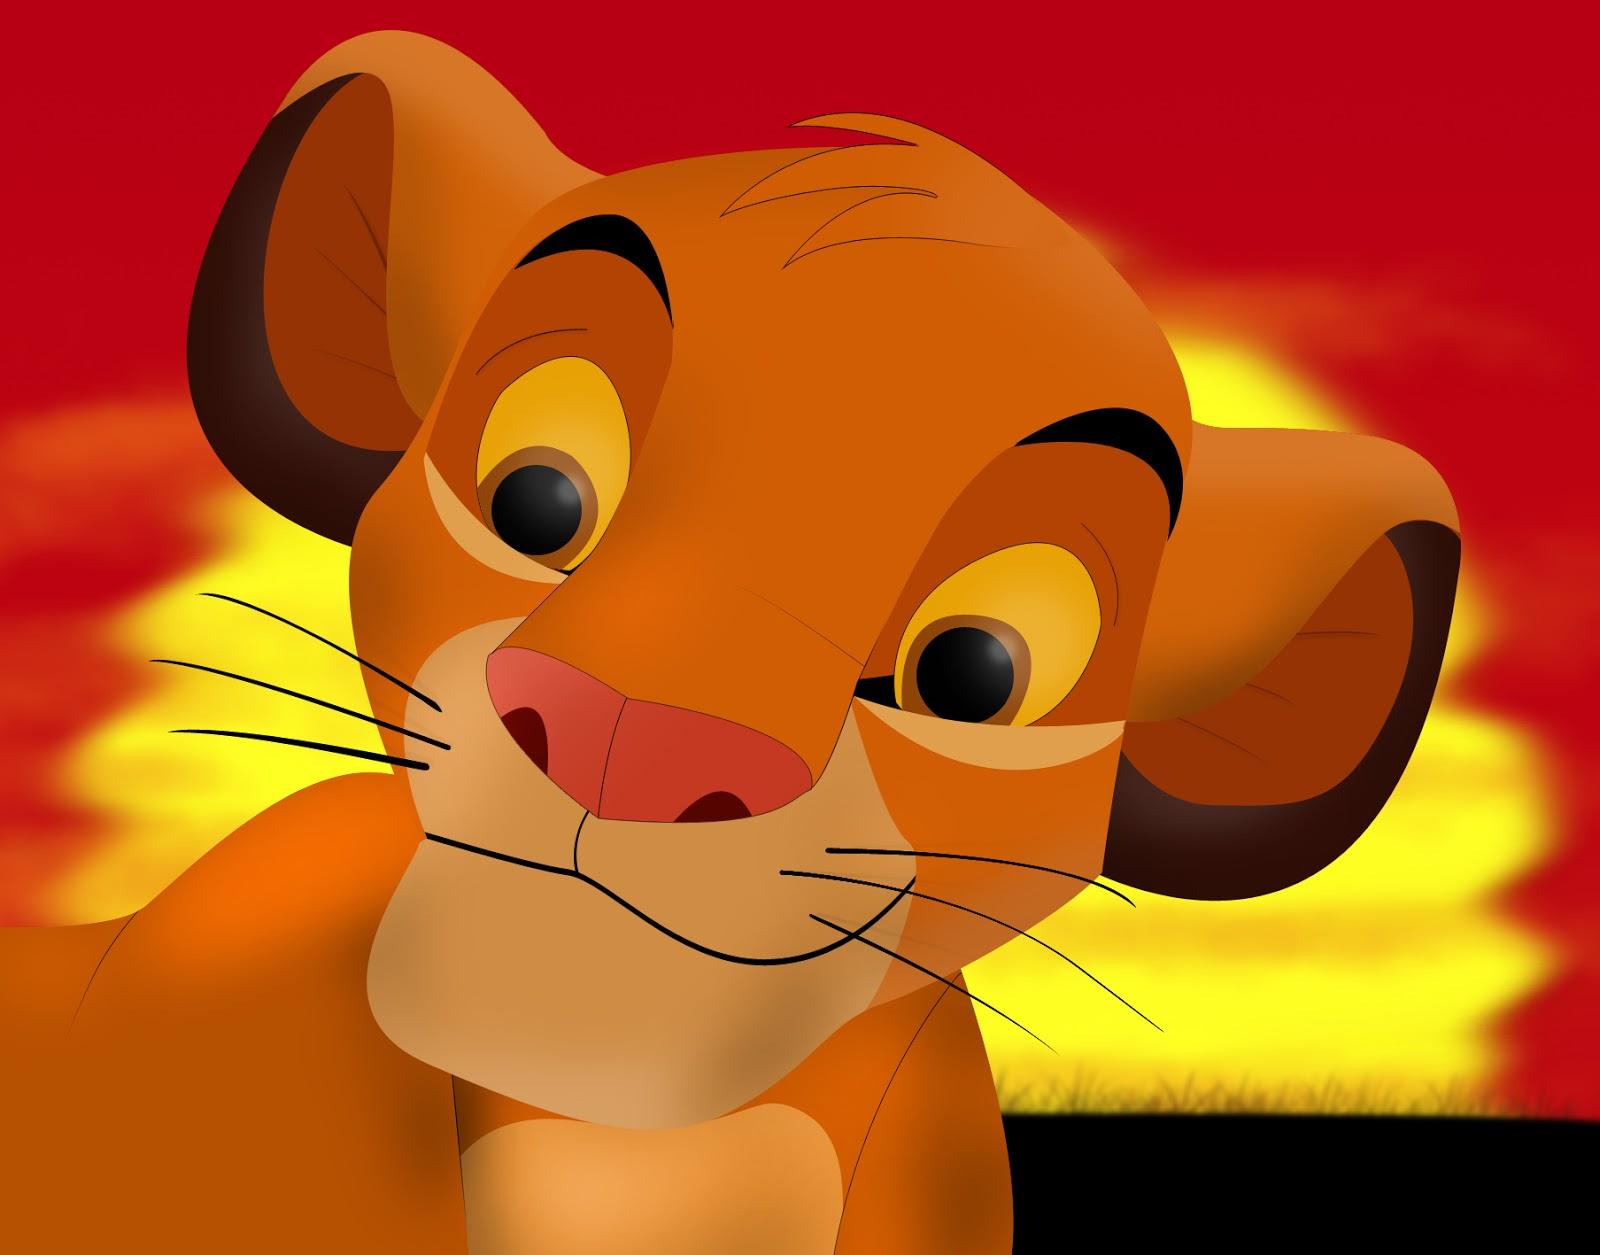 Leadership: Lion King: Simba